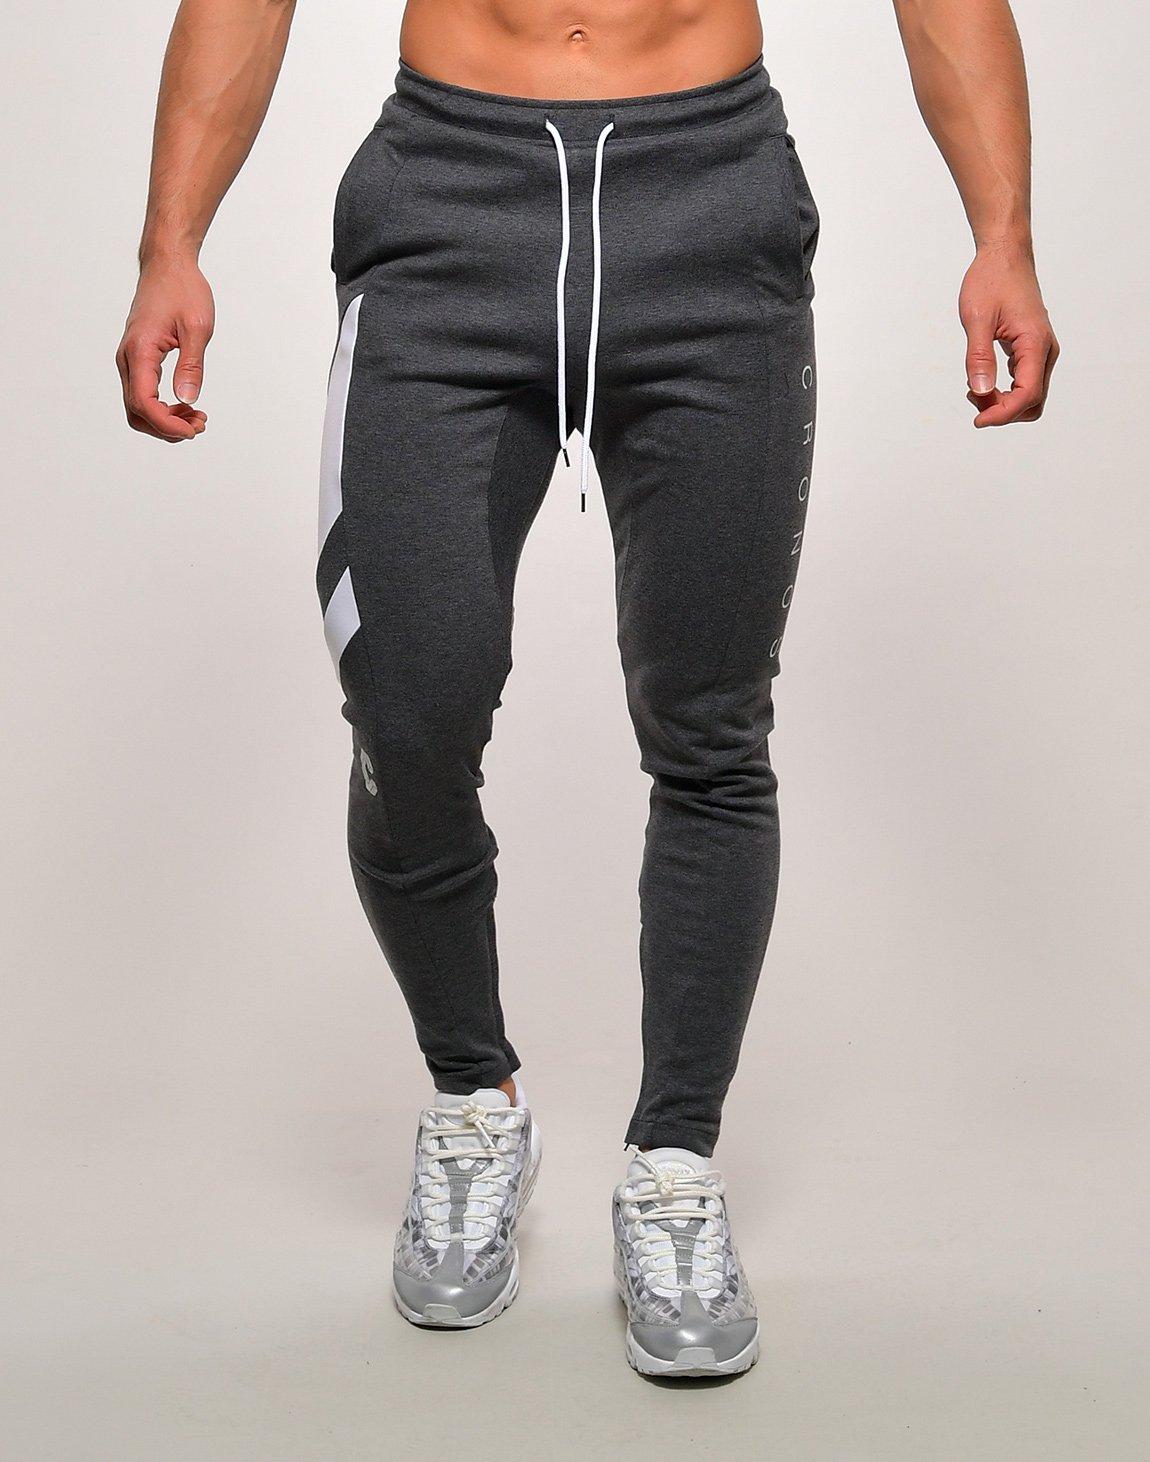 CRONOS SLANTED LINE PANTS【C.GRAY】